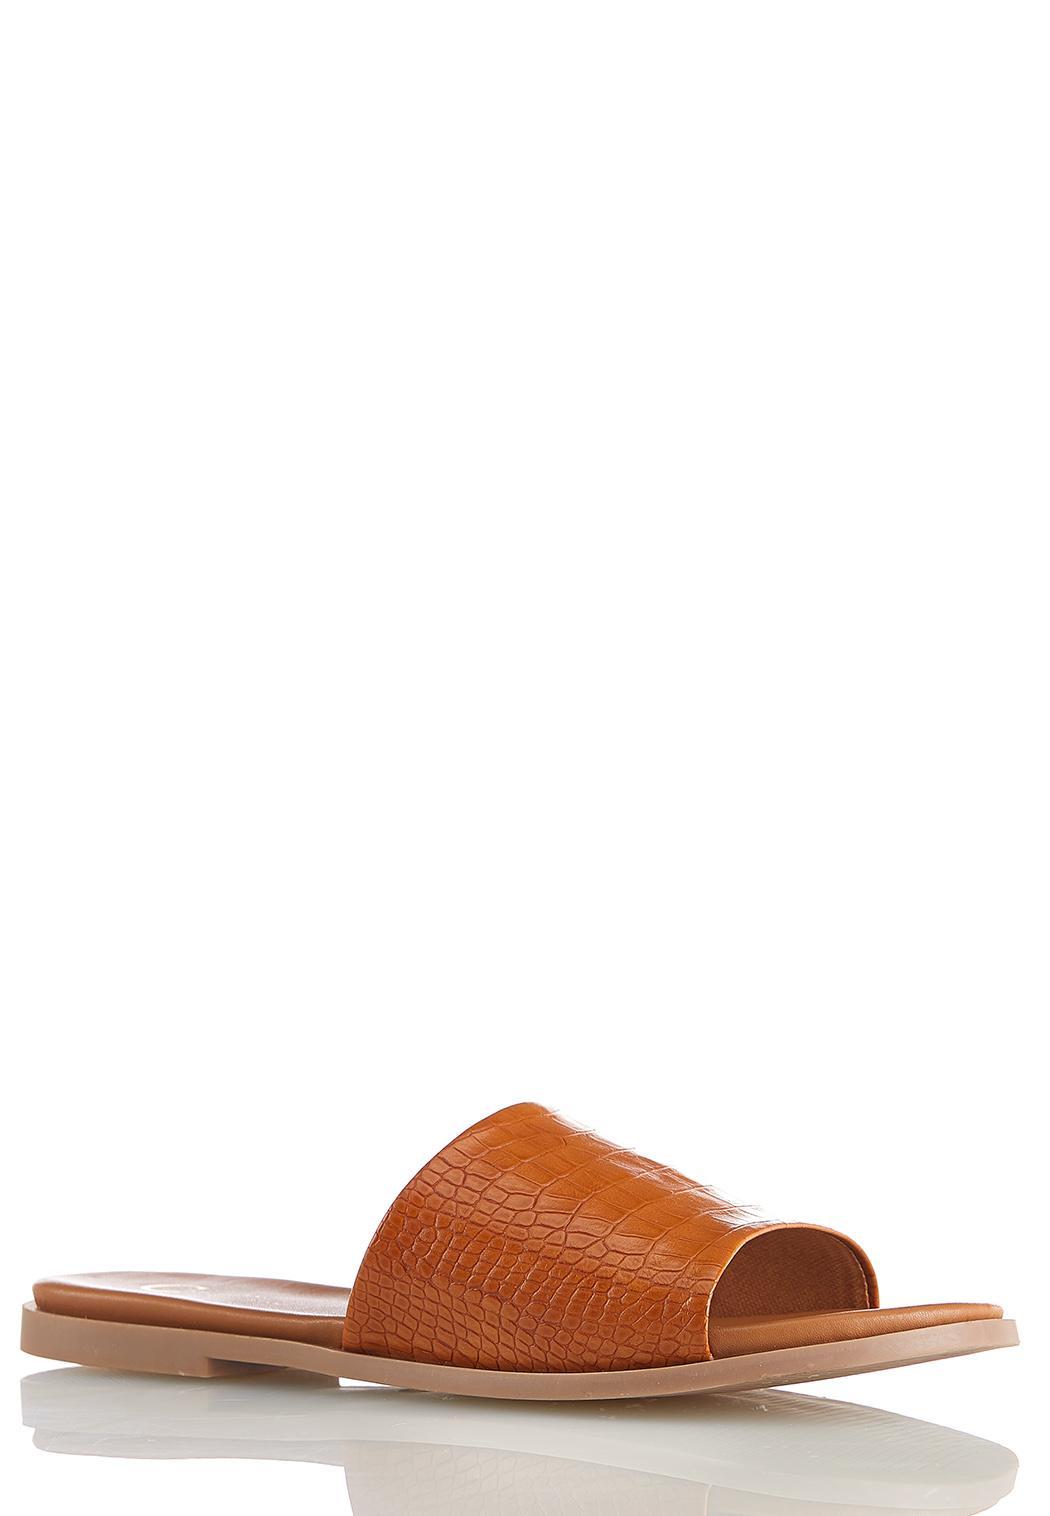 Croc Band Slide Sandals